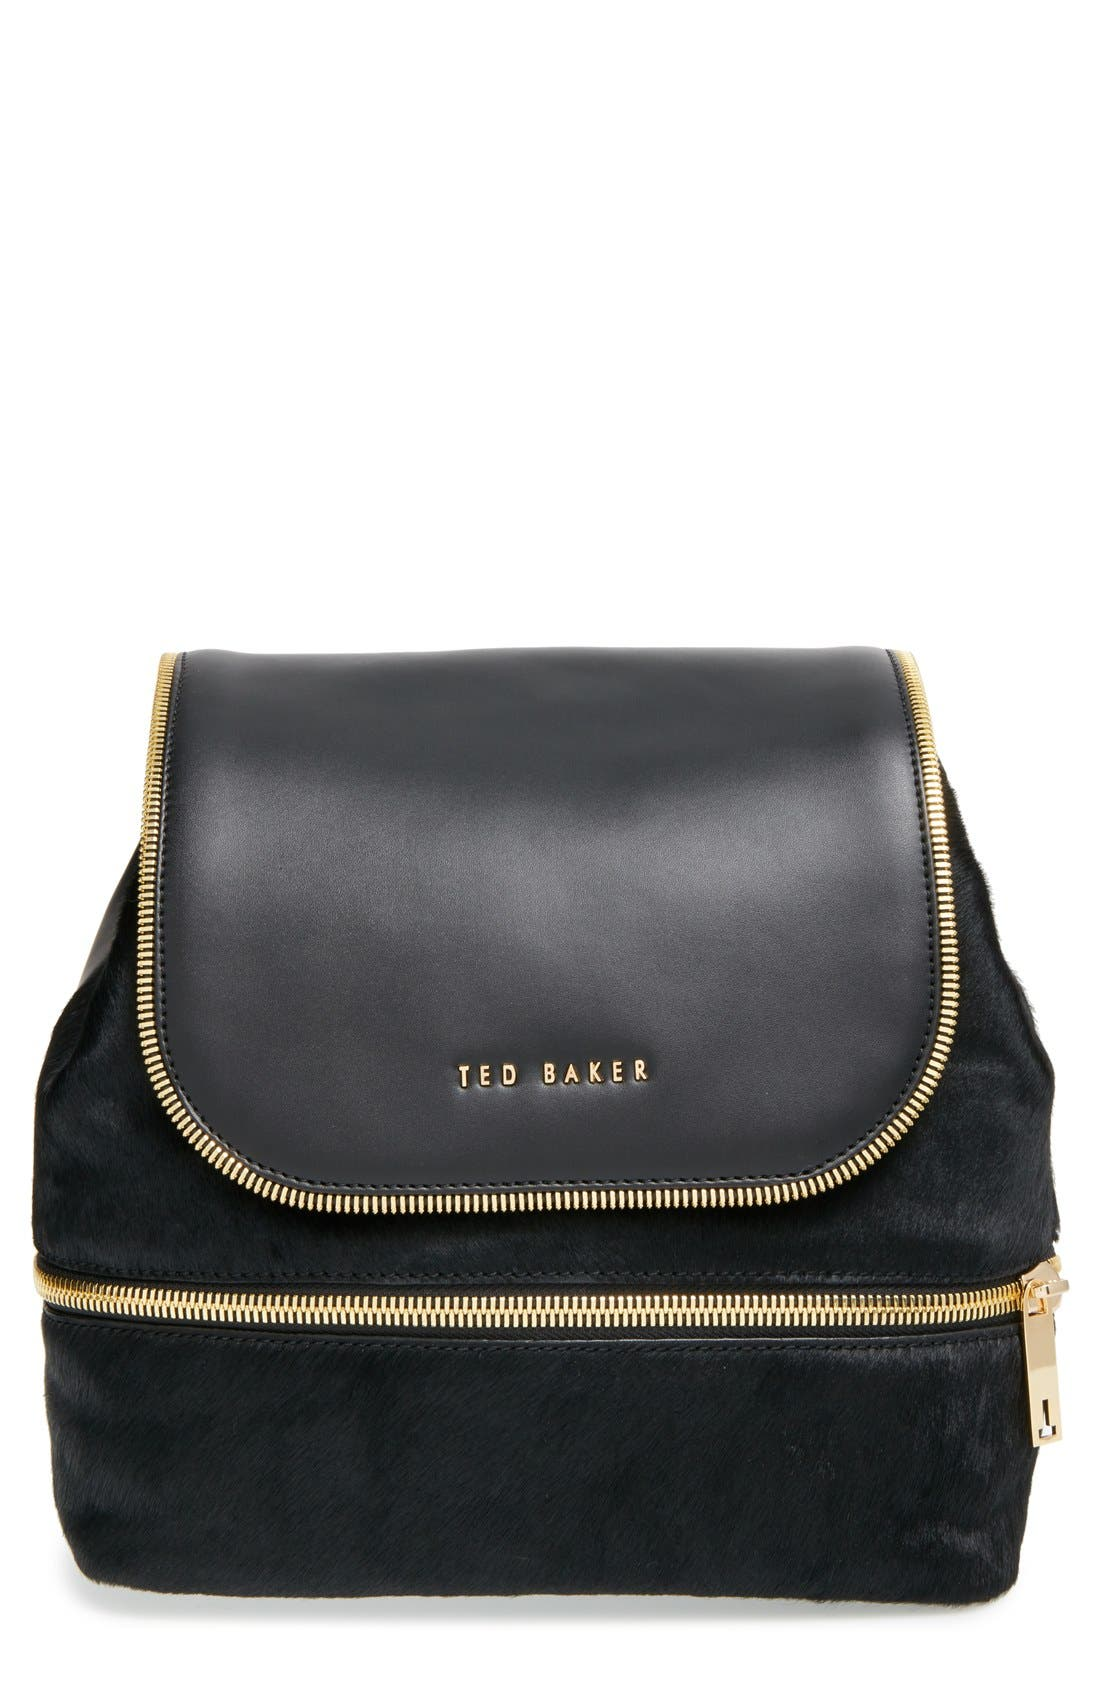 Alternate Image 1 Selected - Ted Baker London Genuine Calf Hair & Leather Backpack